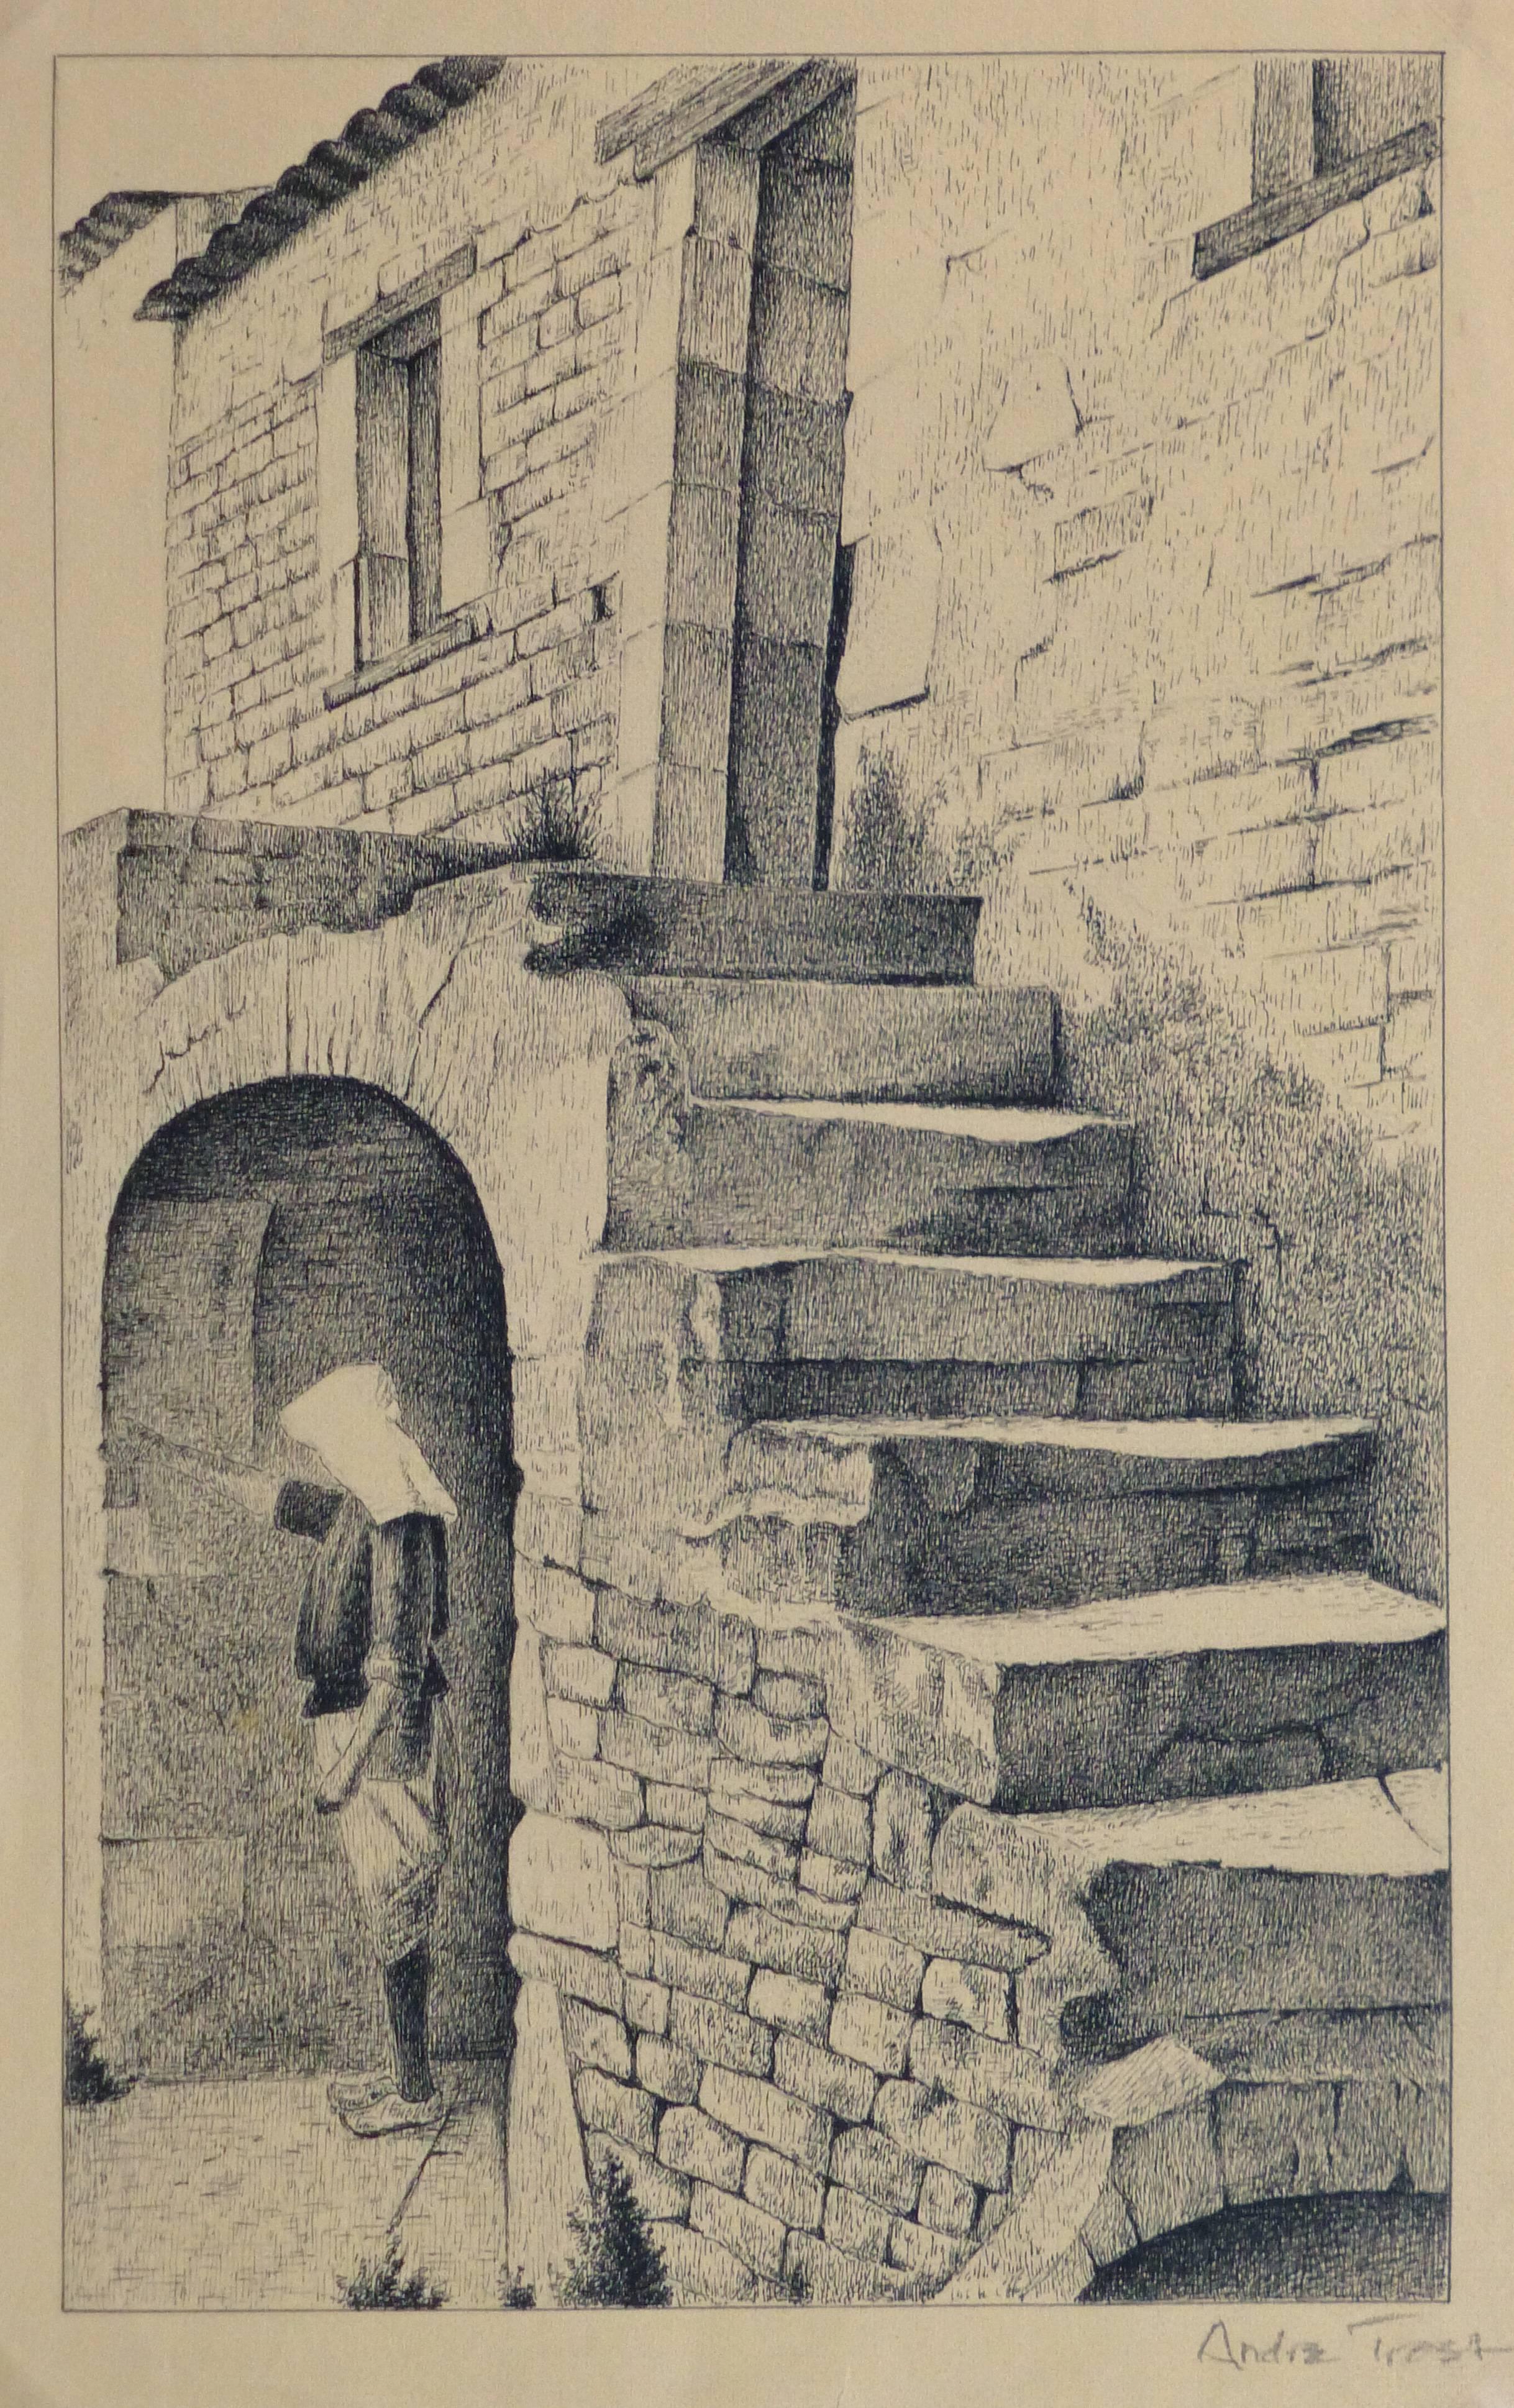 Vintage French Lithograph - Village Scene